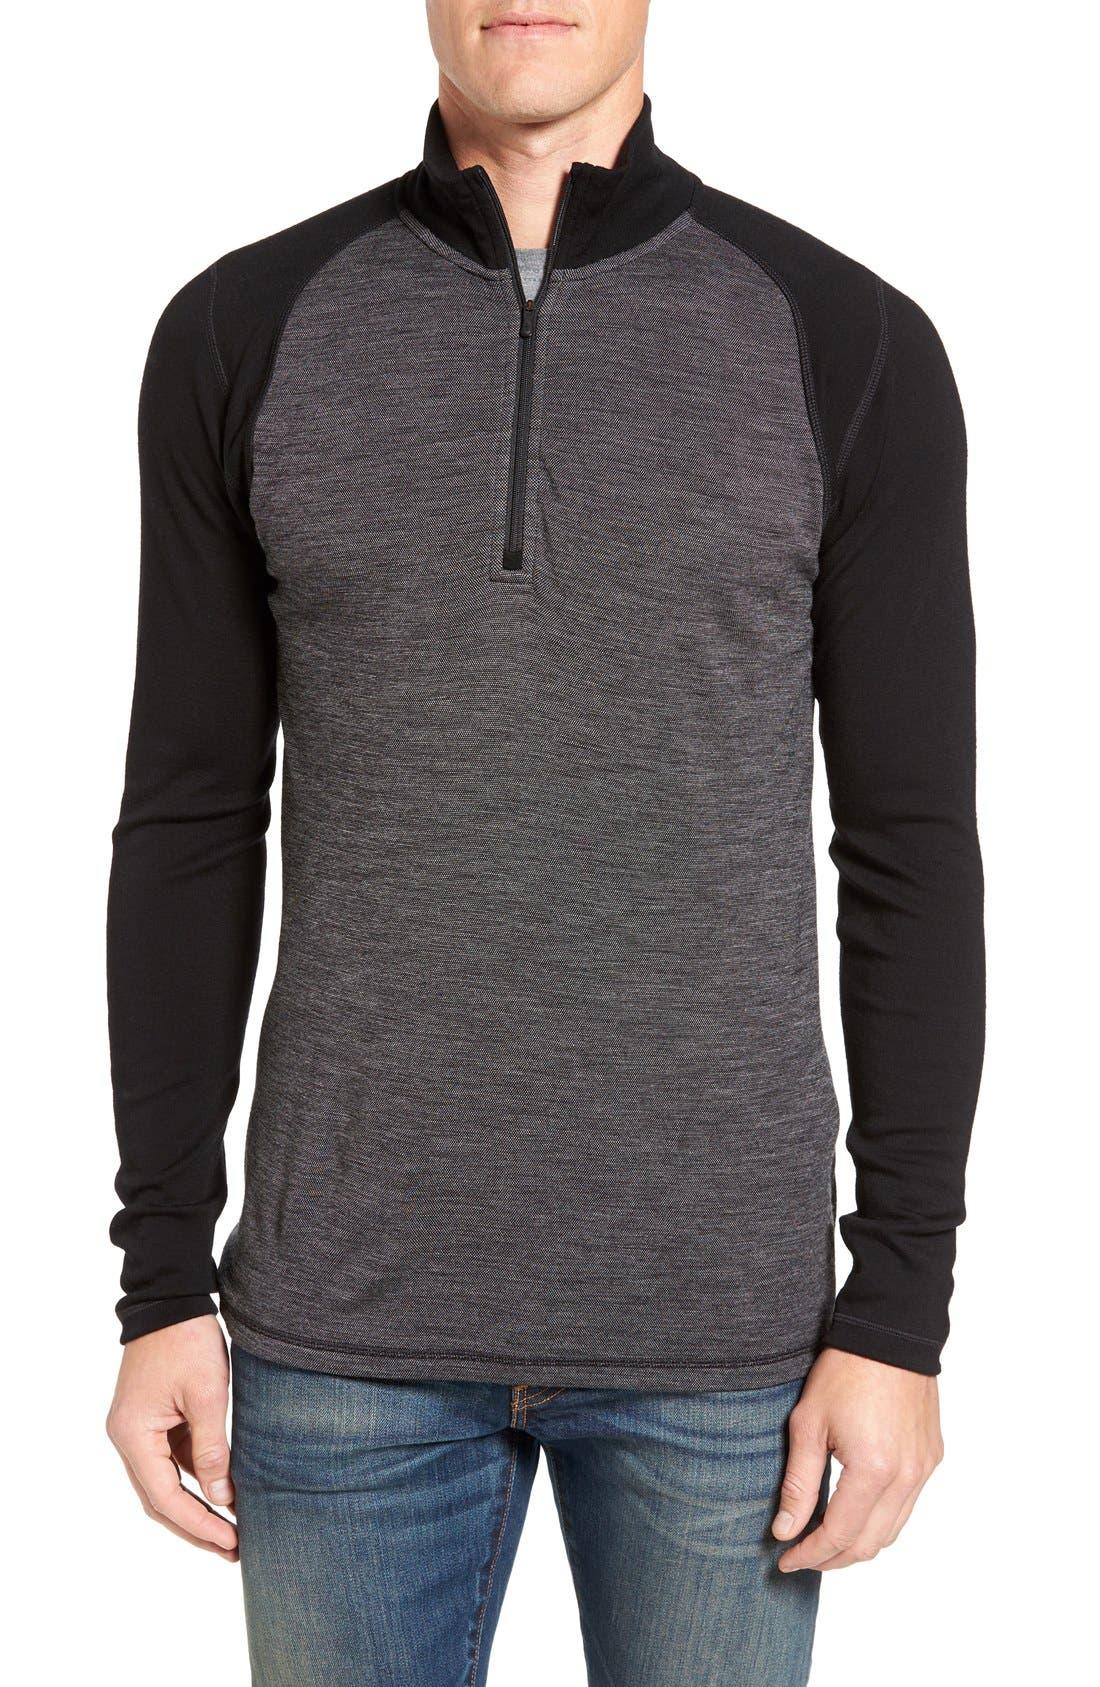 Smartwool Mid 250 Quarter Zip Merino Wool Pullover